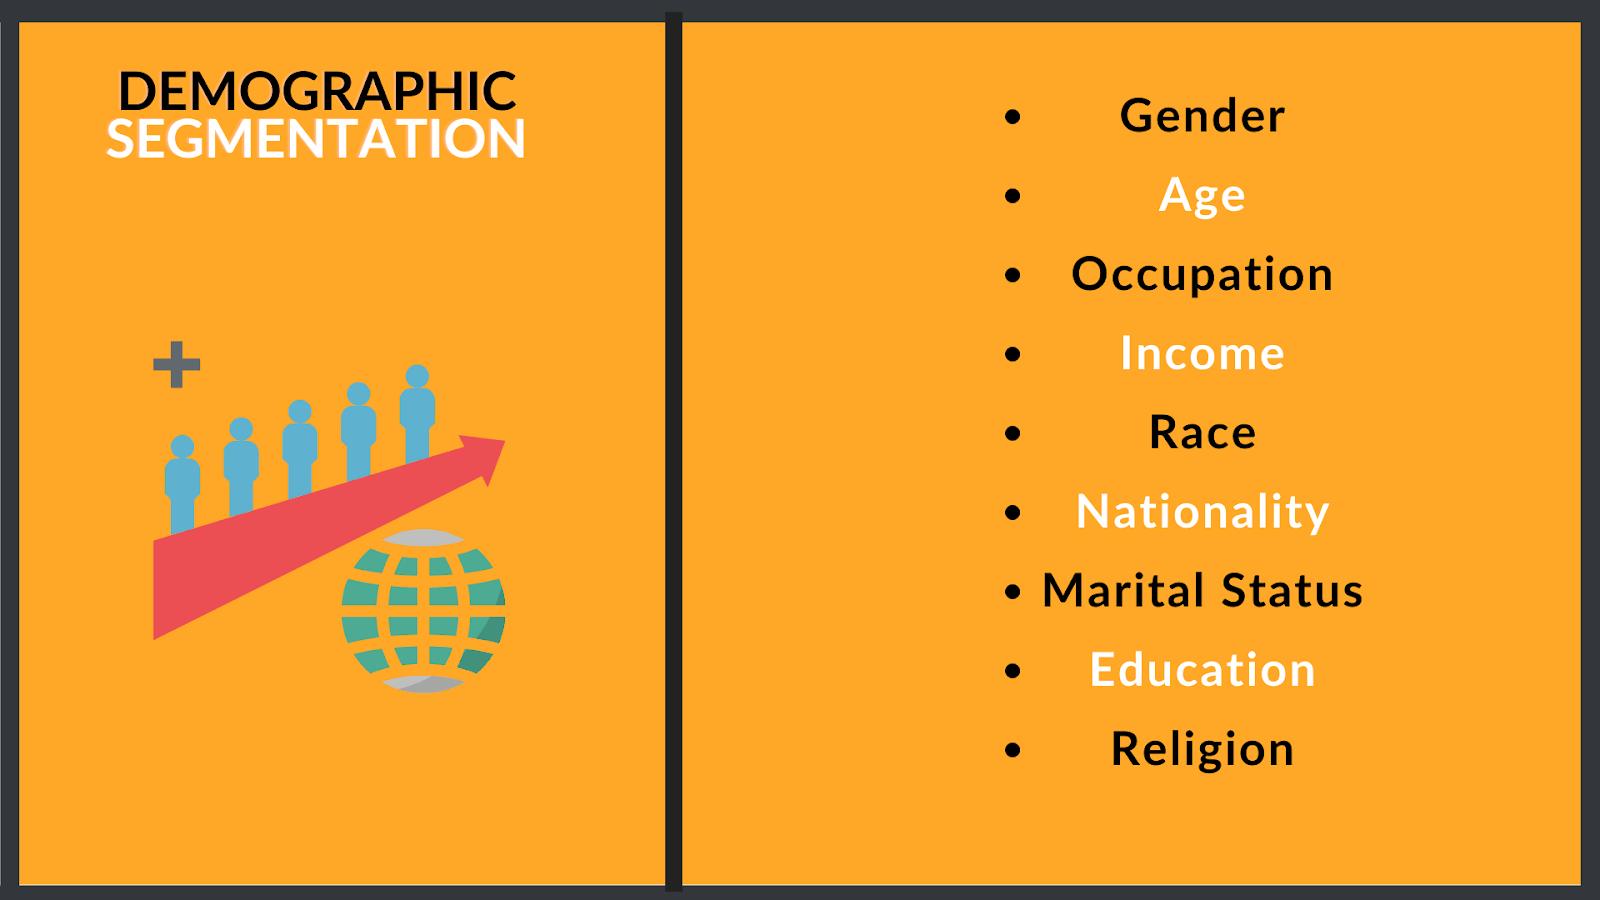 how to segmentate based on demograhpic